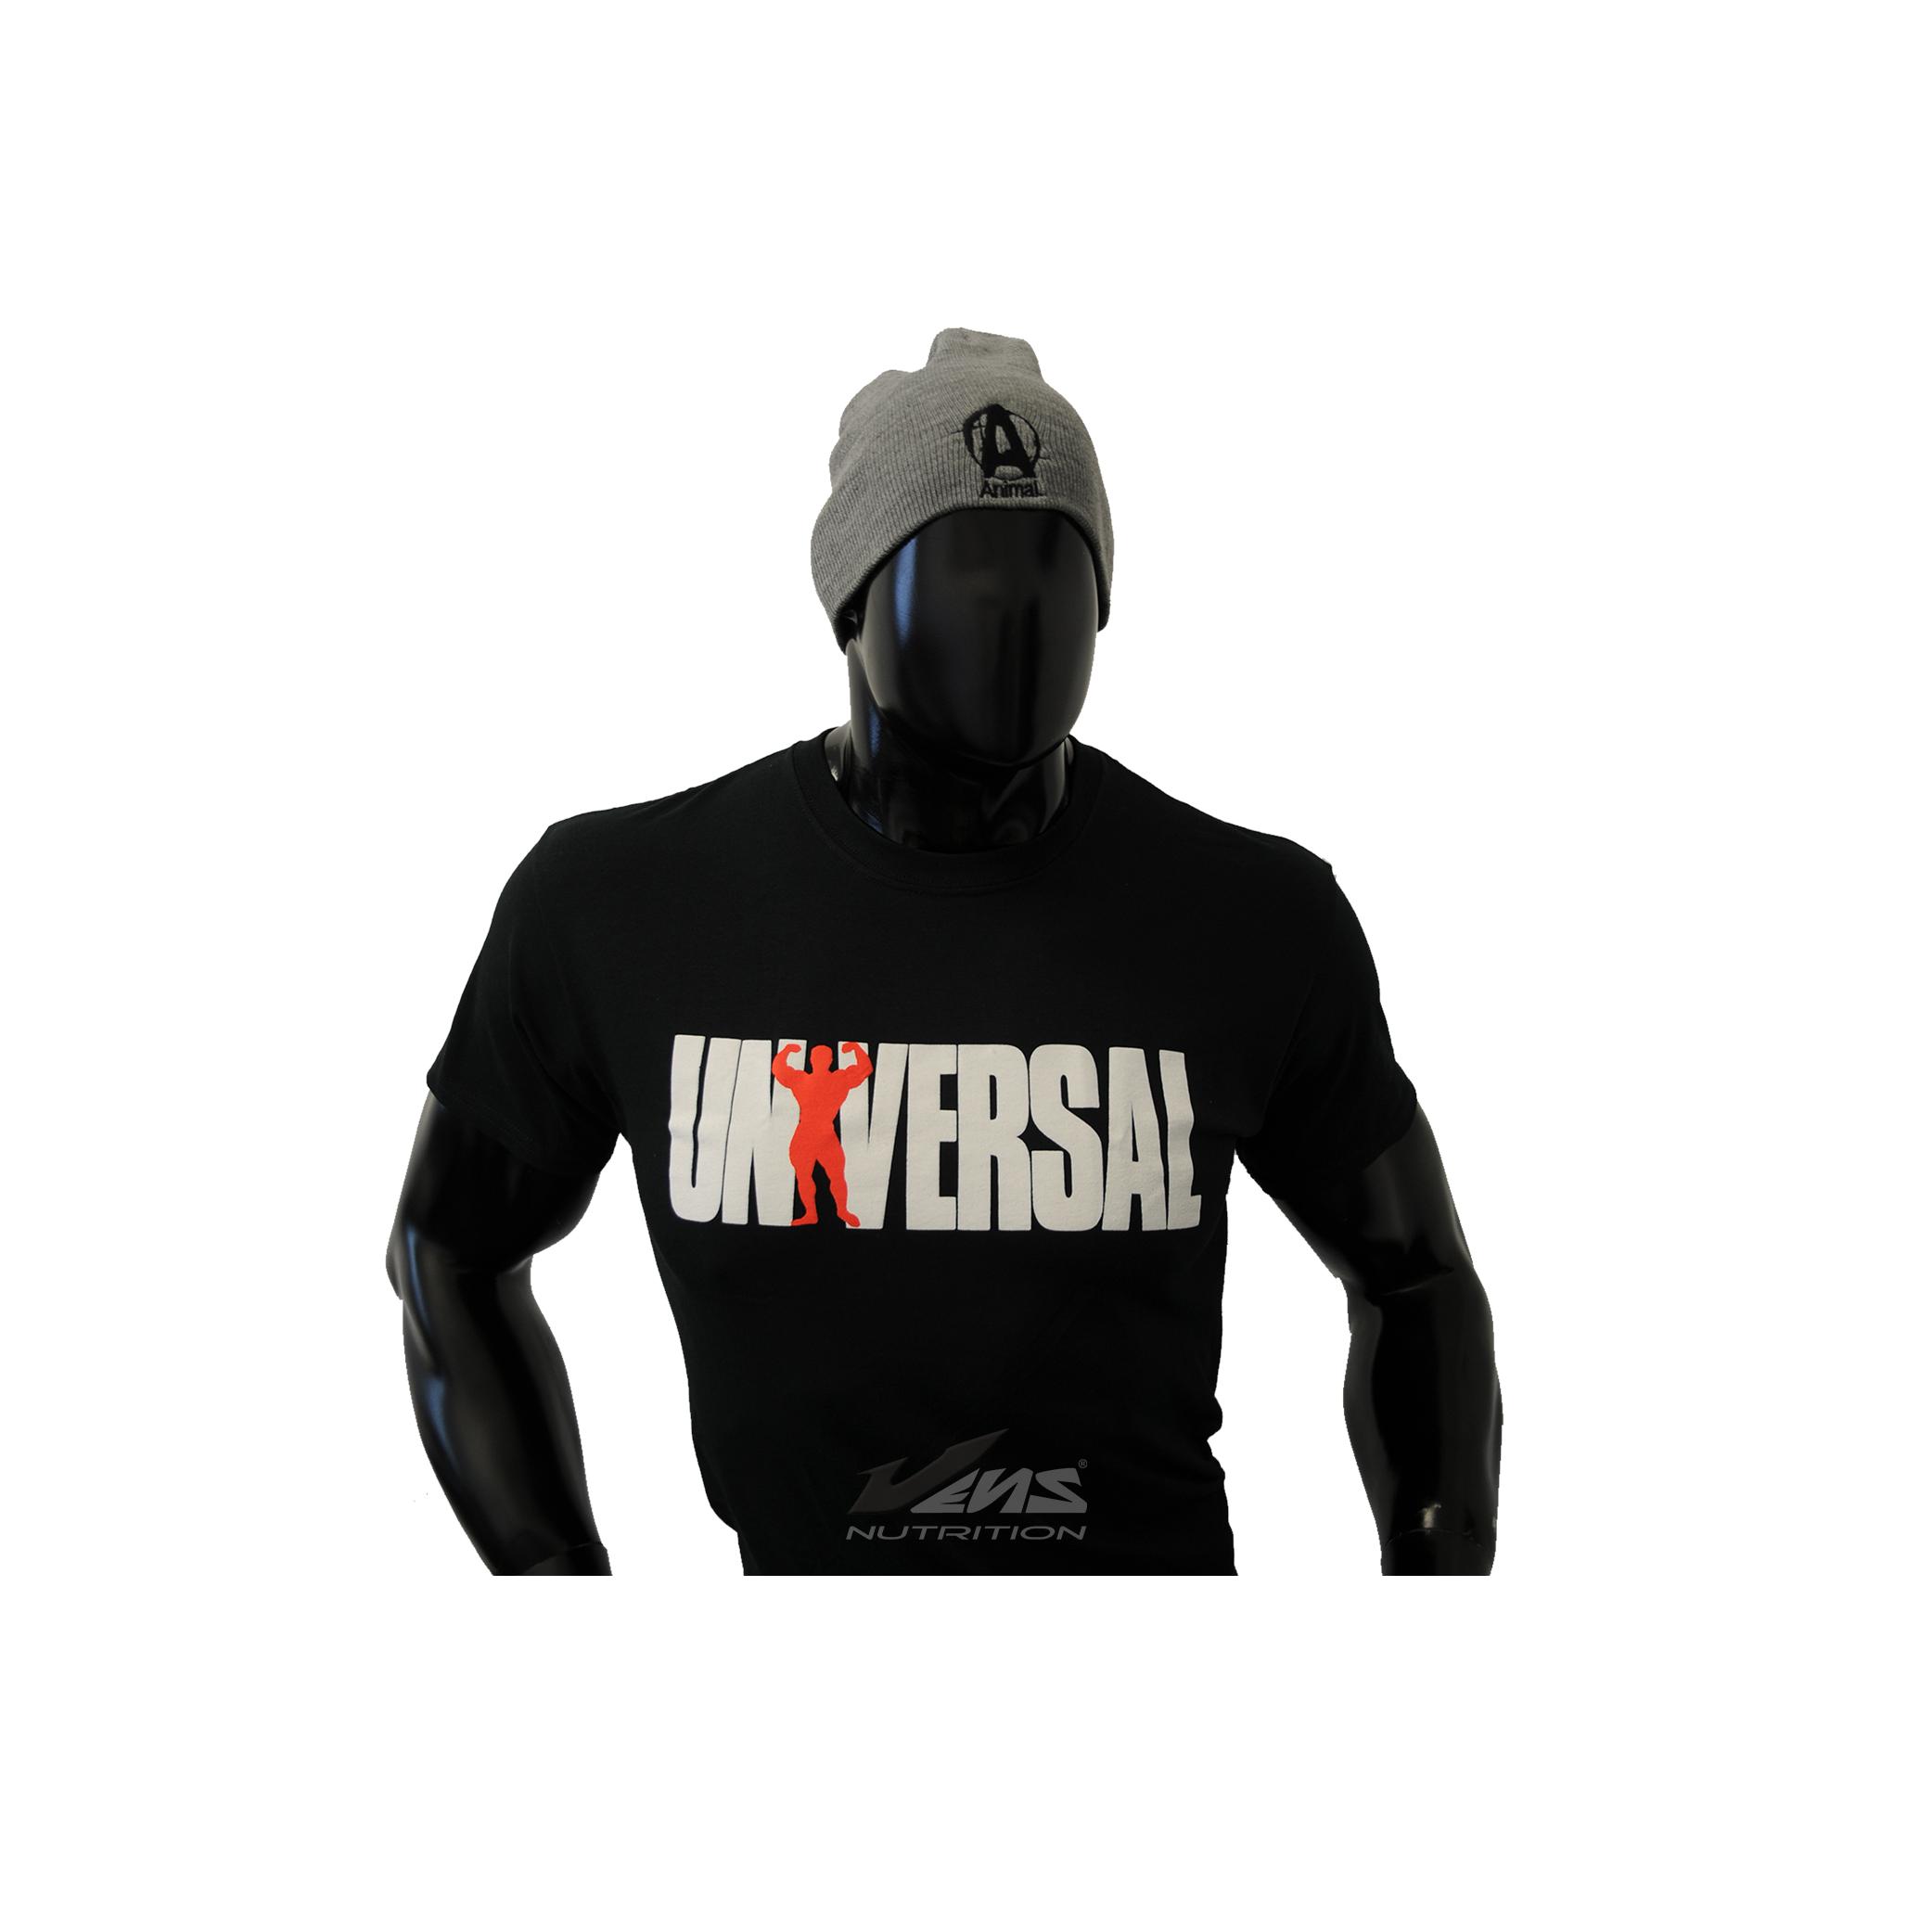 UNIVERSAL-BLACK-SHIRT